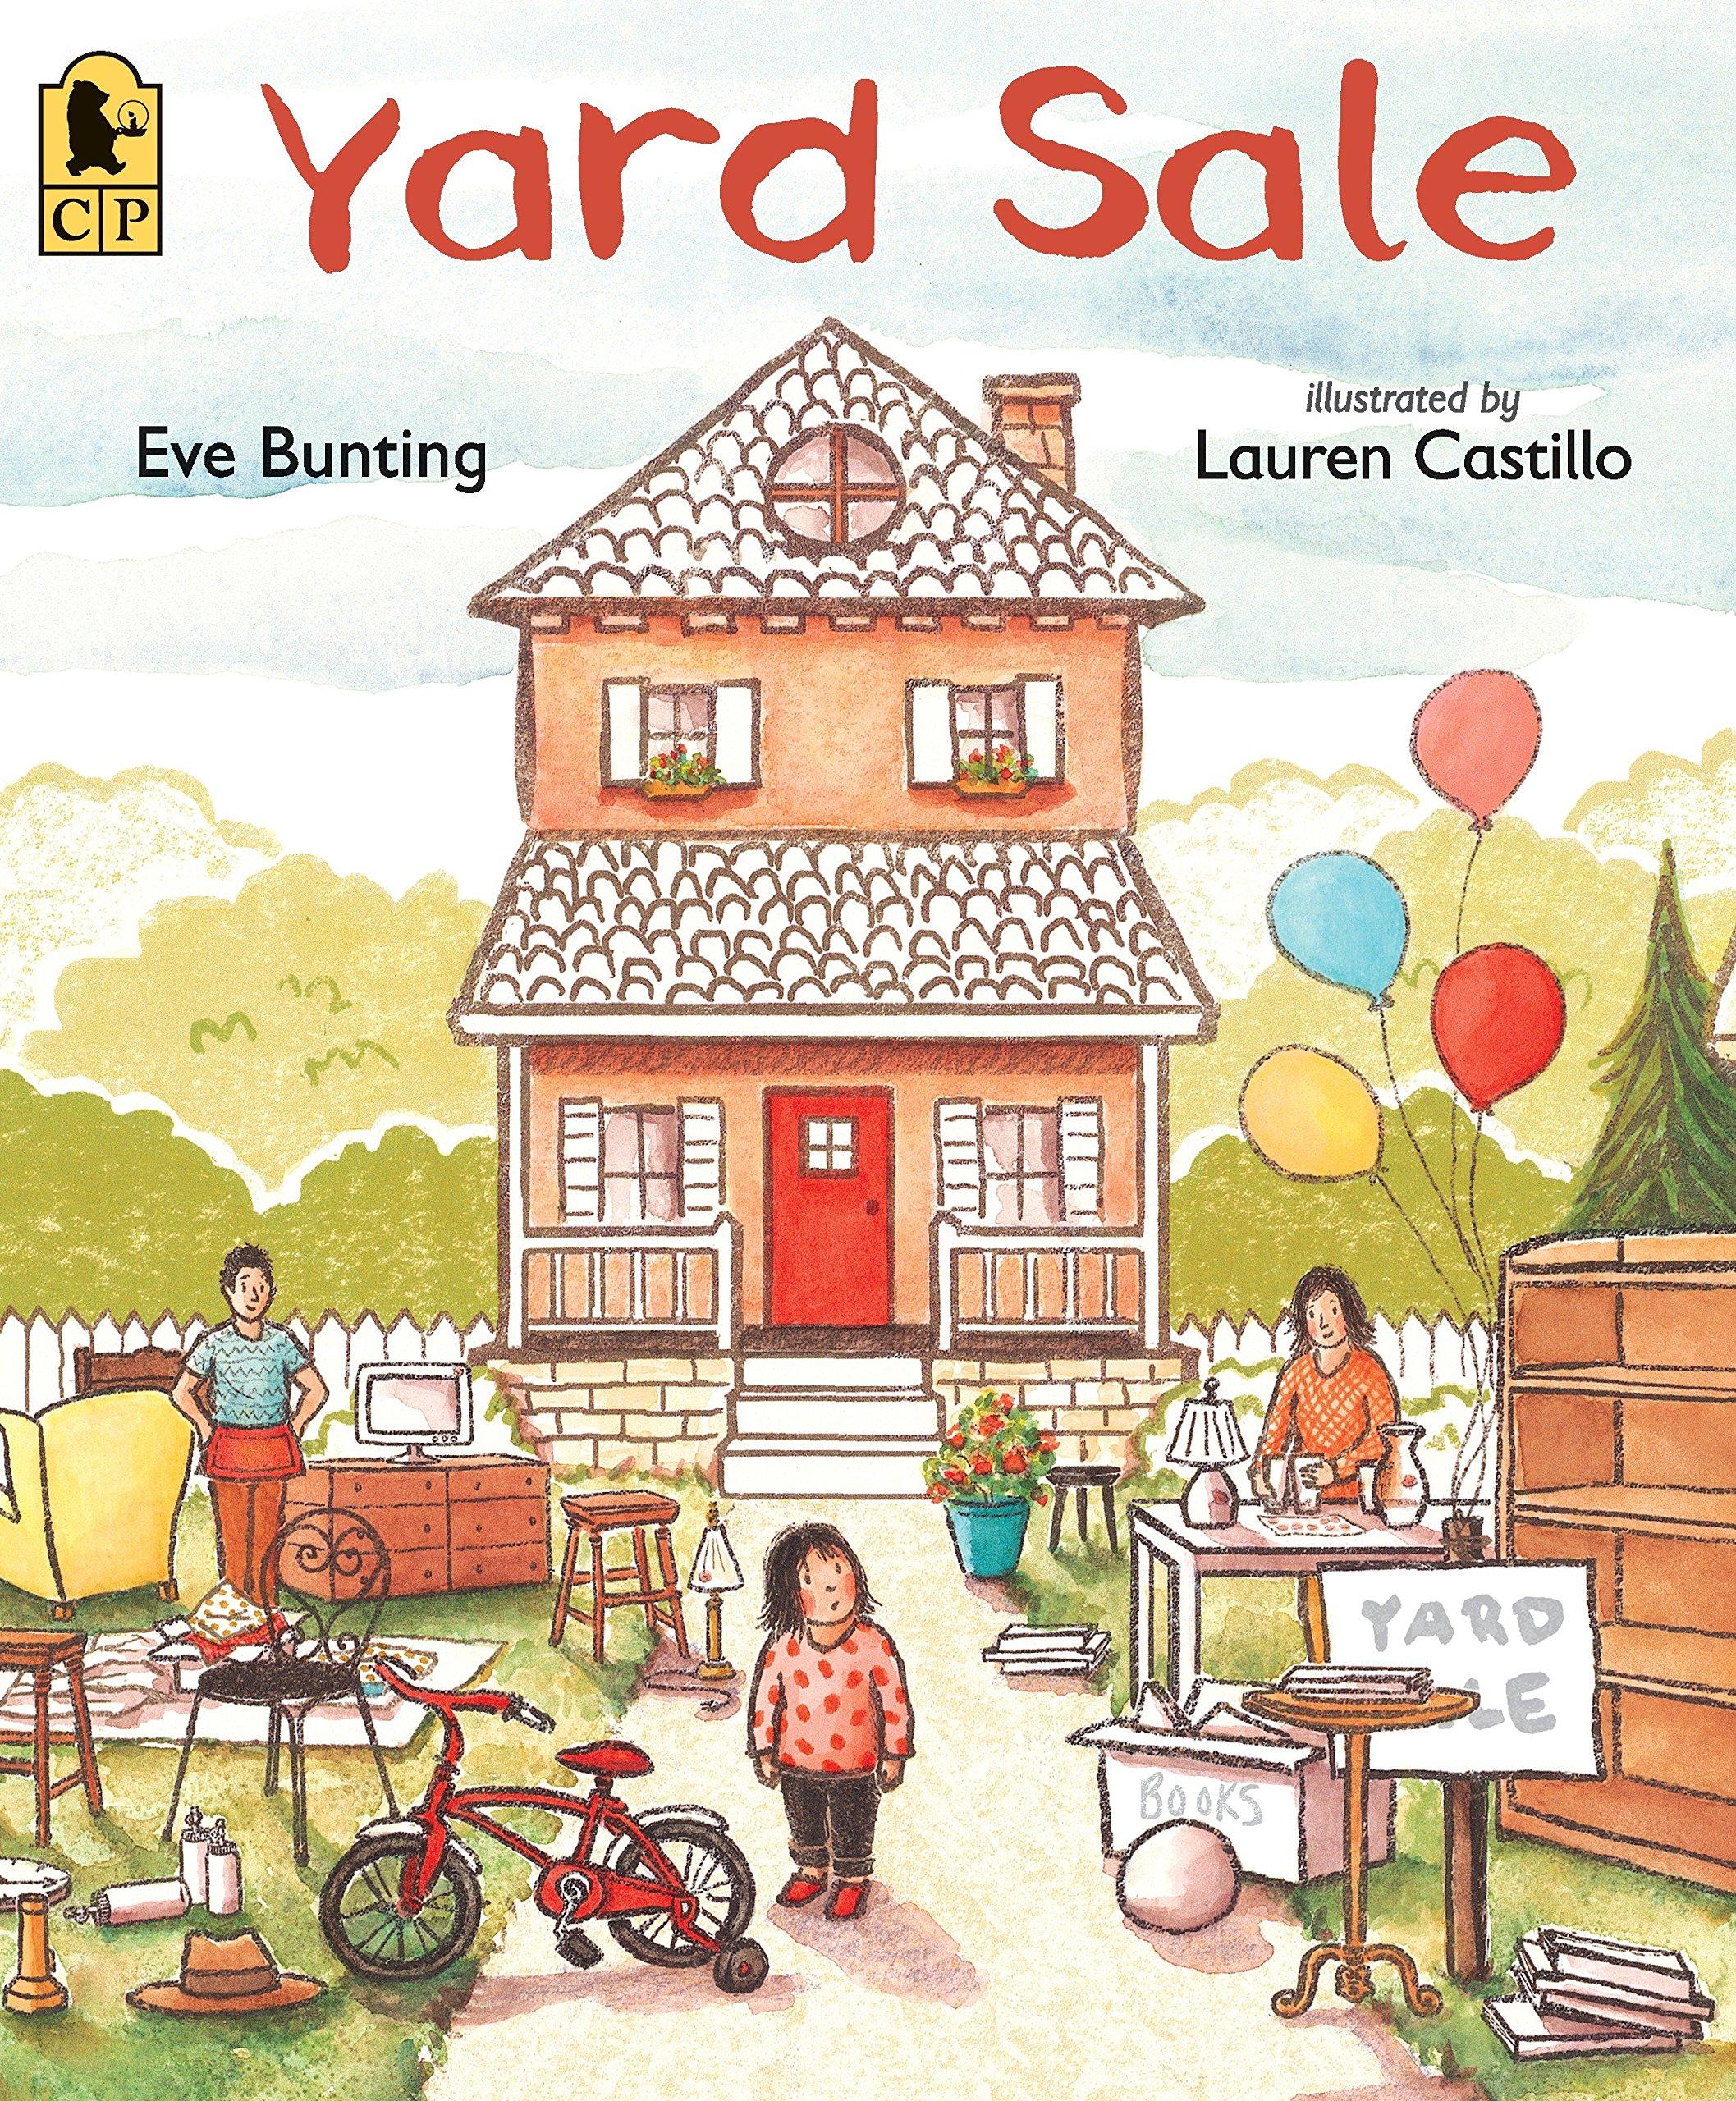 celebrate-picture-books-picture-book-review-yard-sale-cover-2